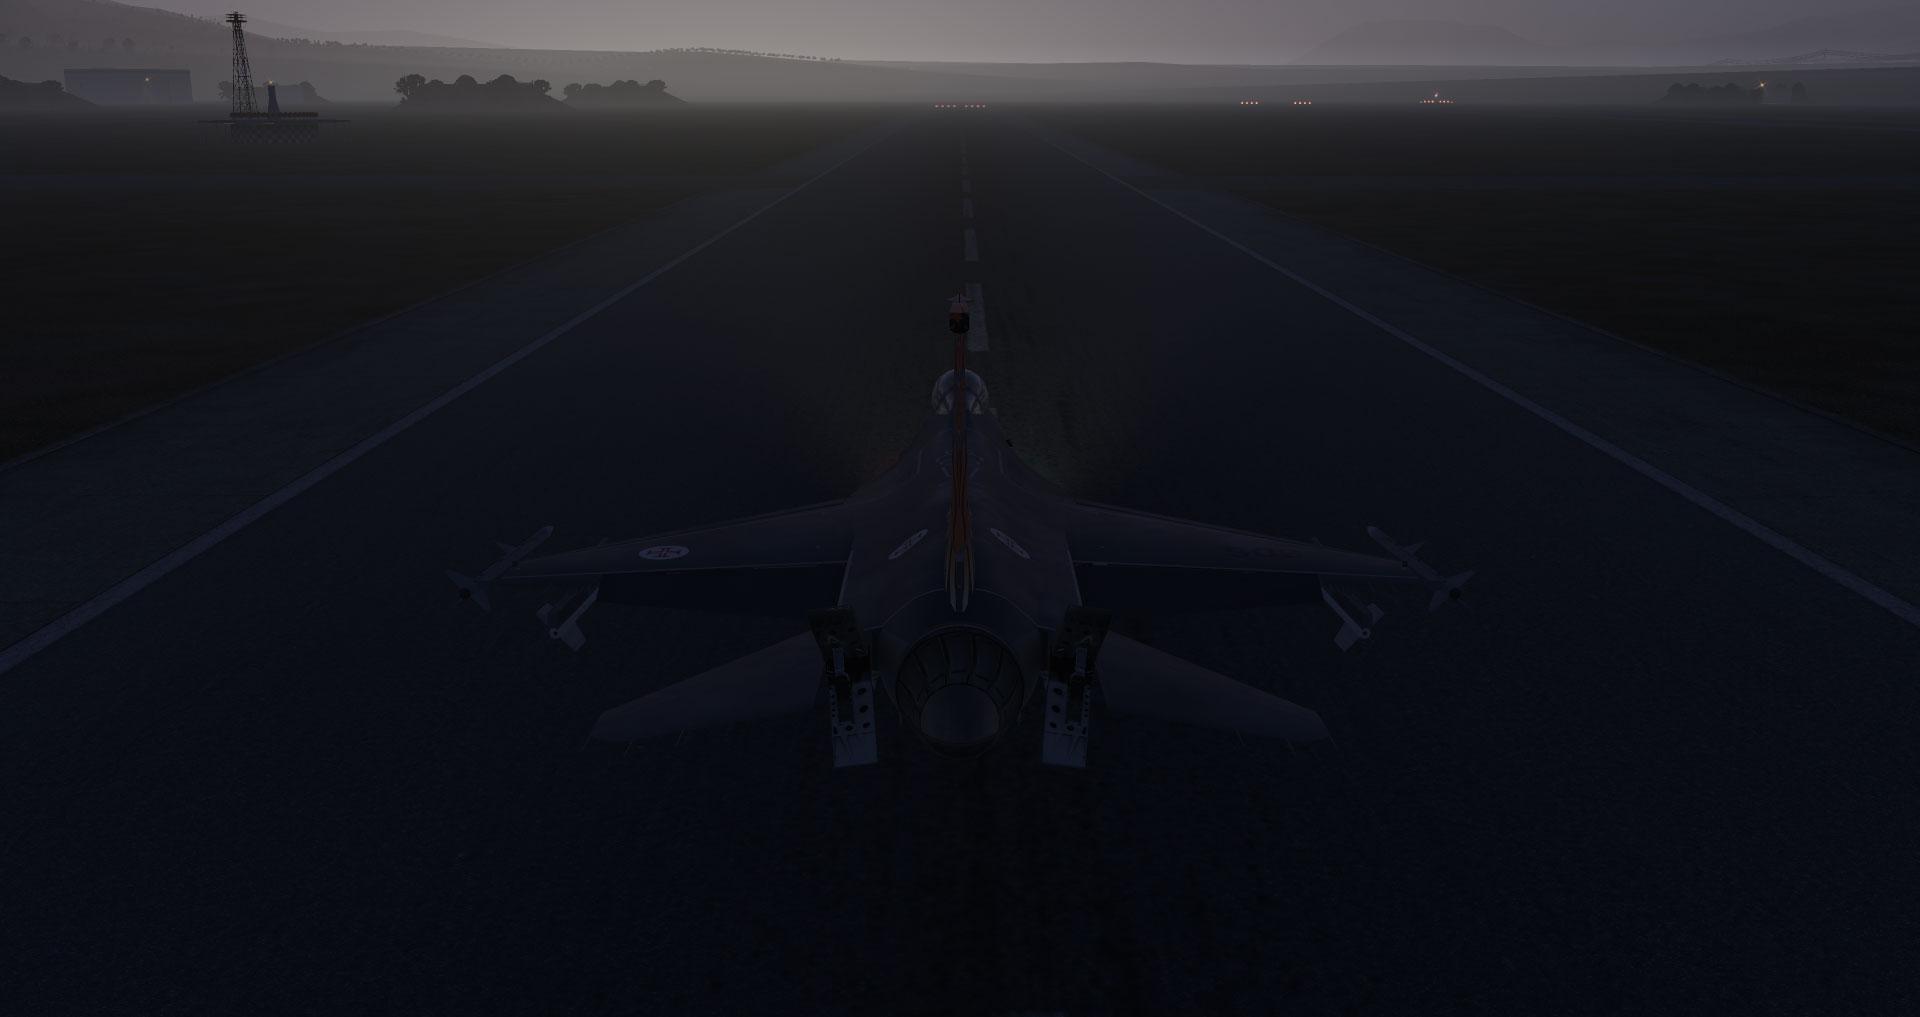 F_16---2021-03-21-17.05